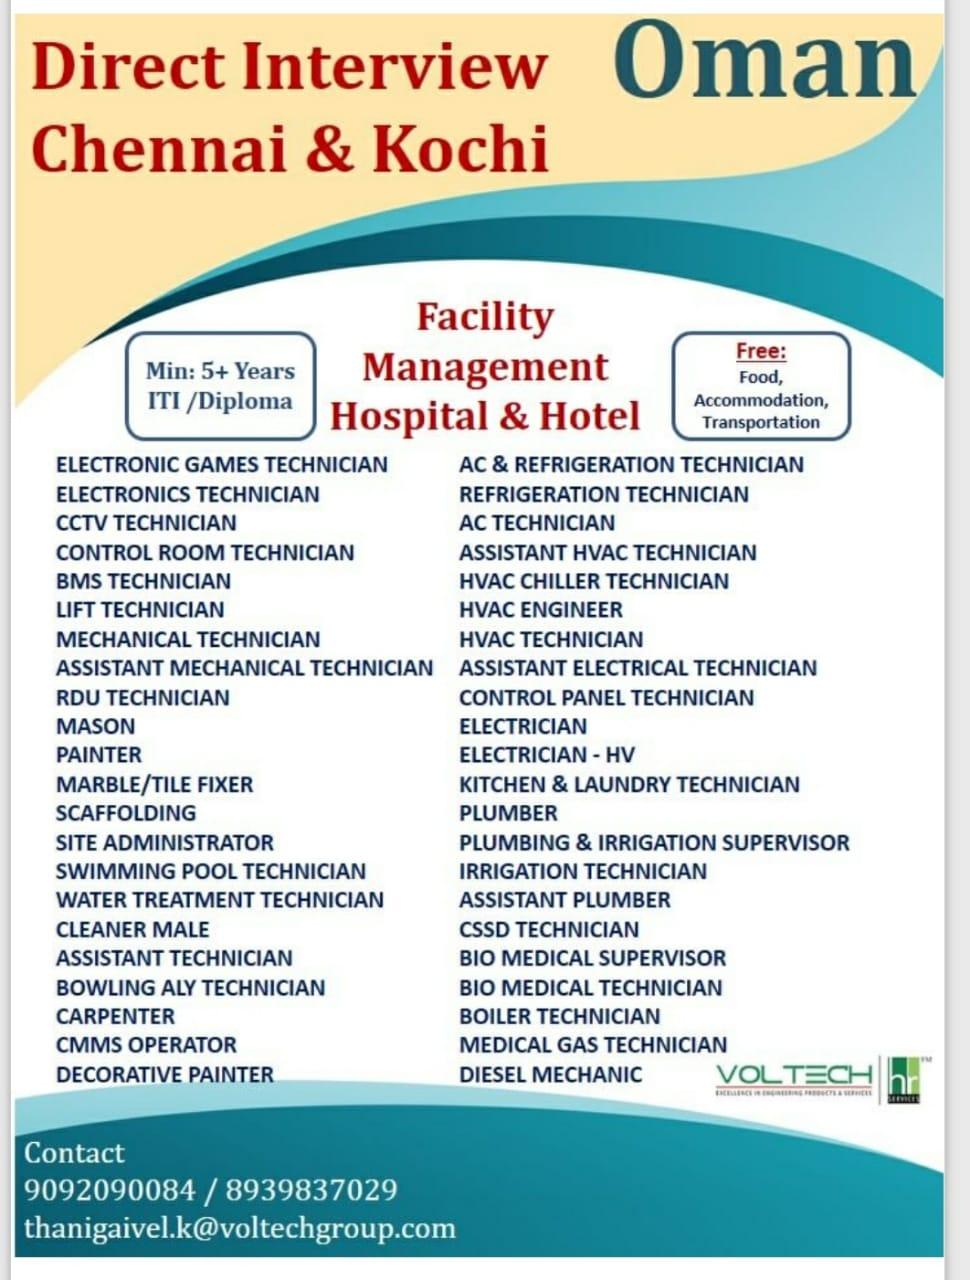 FACILITY MANAGEMENT HOSPITAL & HOTEL-OMAN